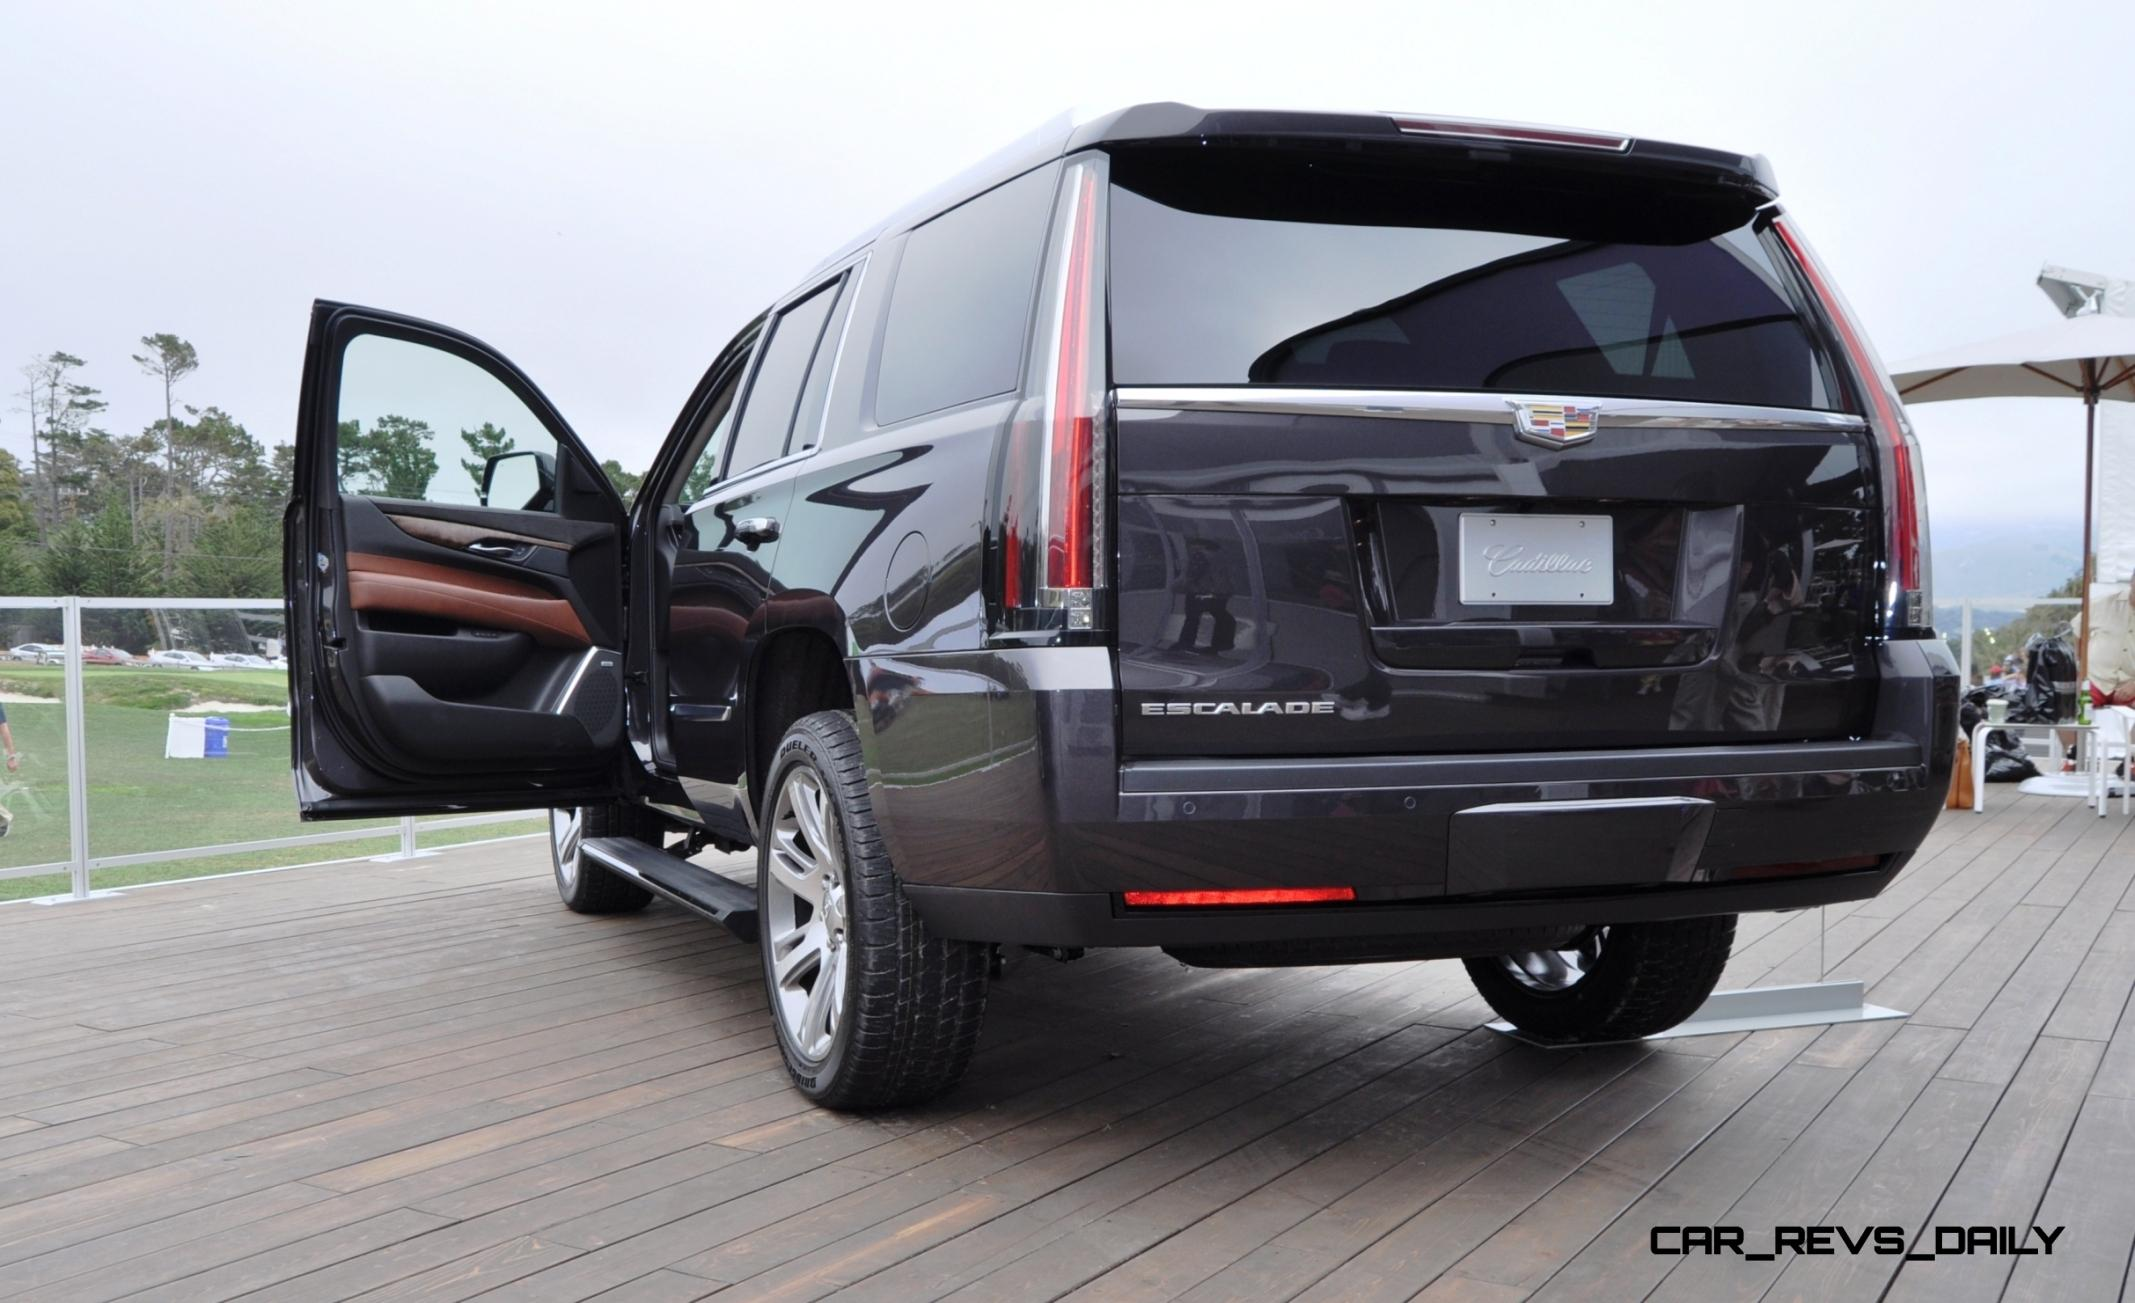 2015 cadillac escalade esv platinum picture car html autos weblog. Black Bedroom Furniture Sets. Home Design Ideas